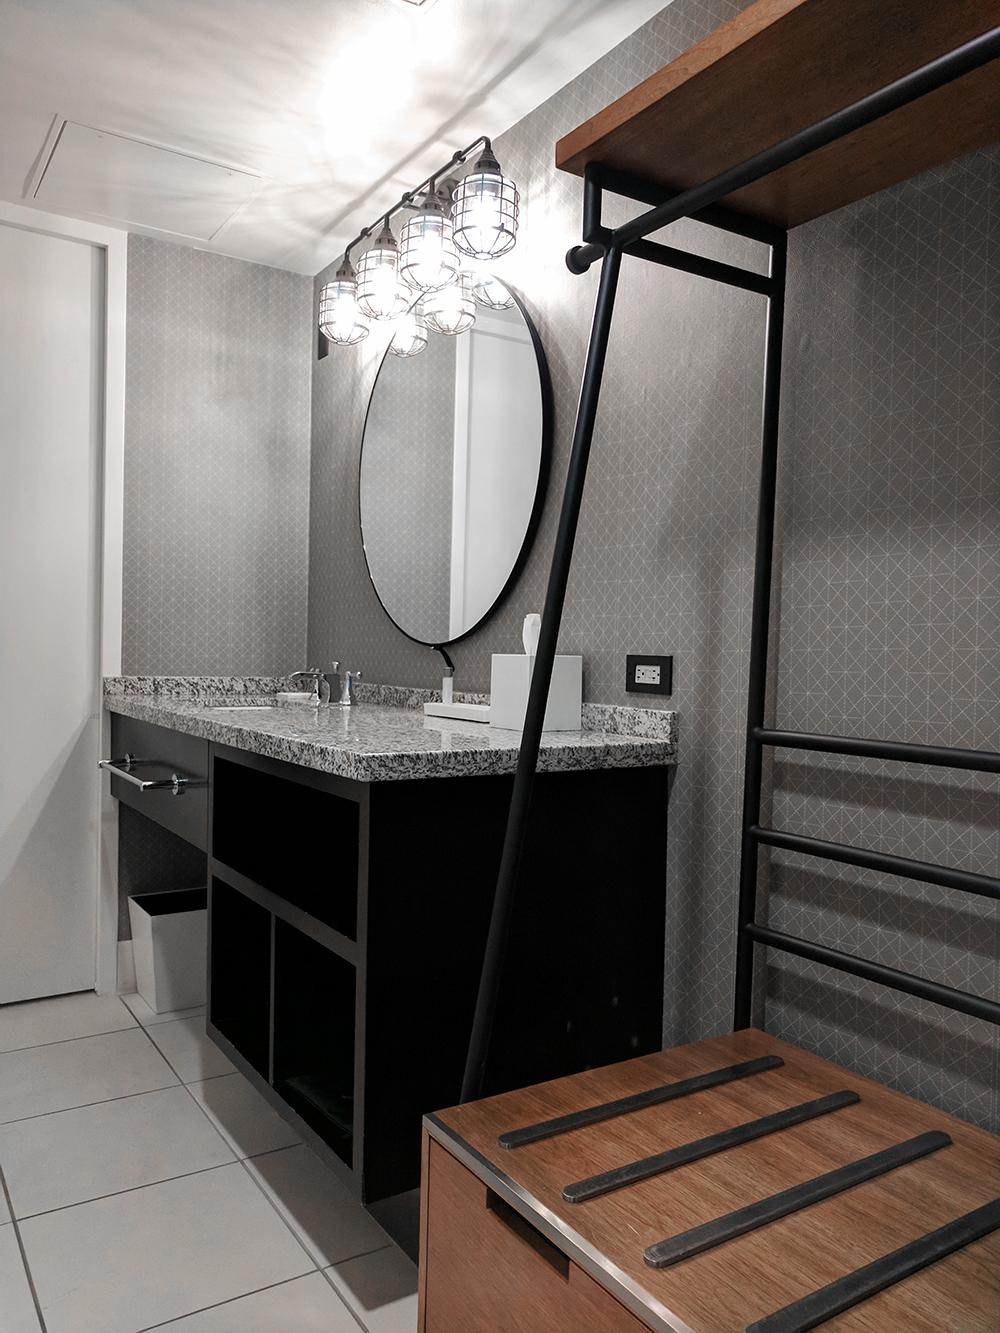 08stanfordcourt-sanfrancisco-sf-travel-bathroom-decor